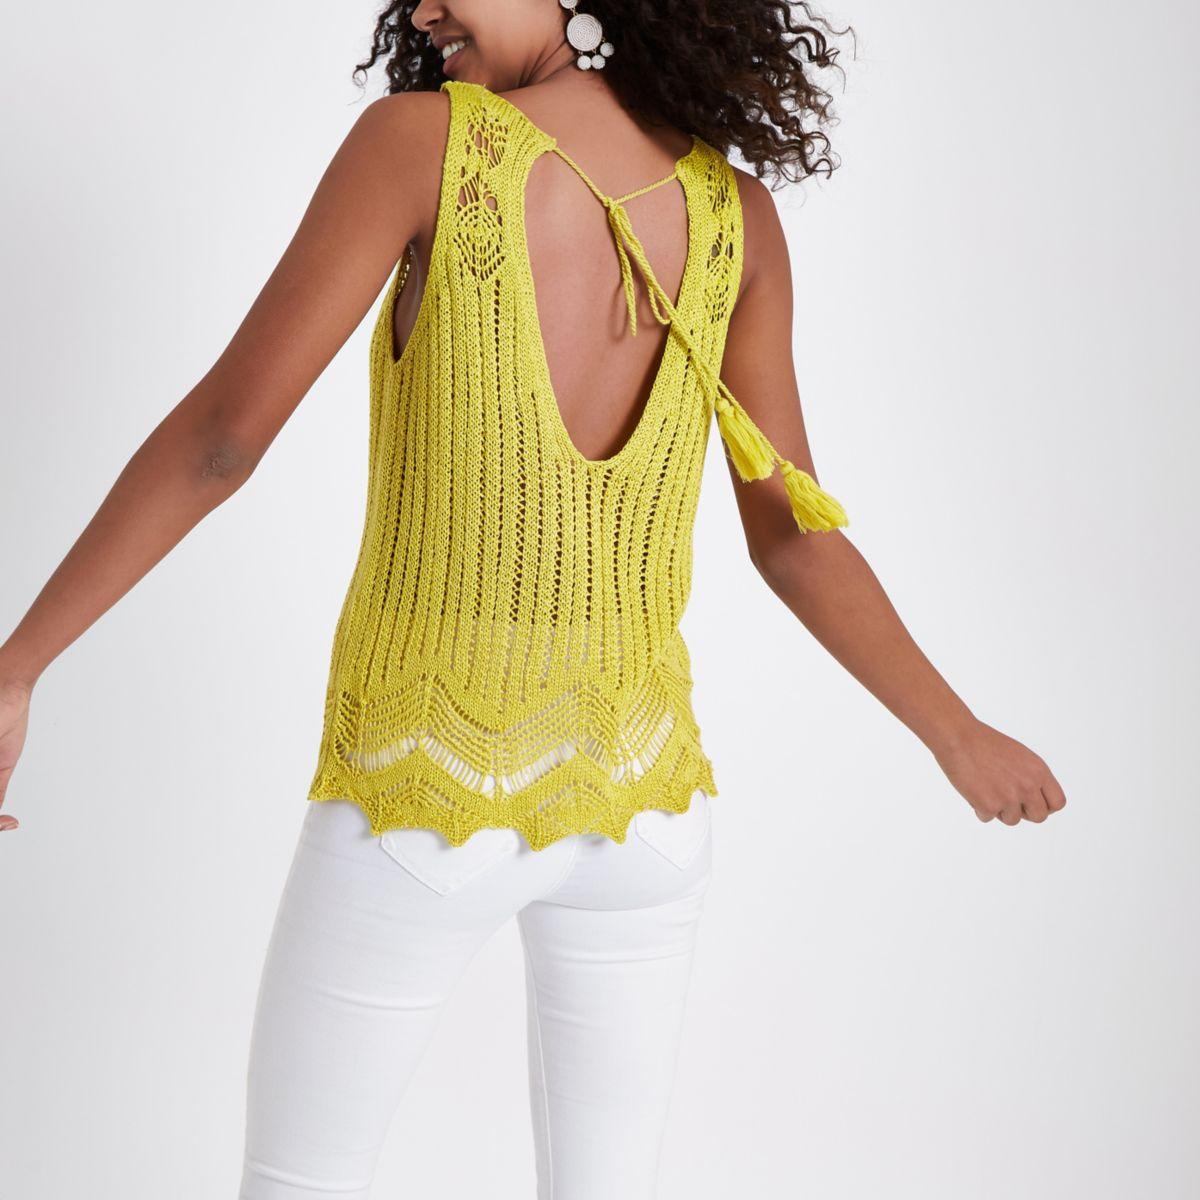 Yellow crochet knit tank top